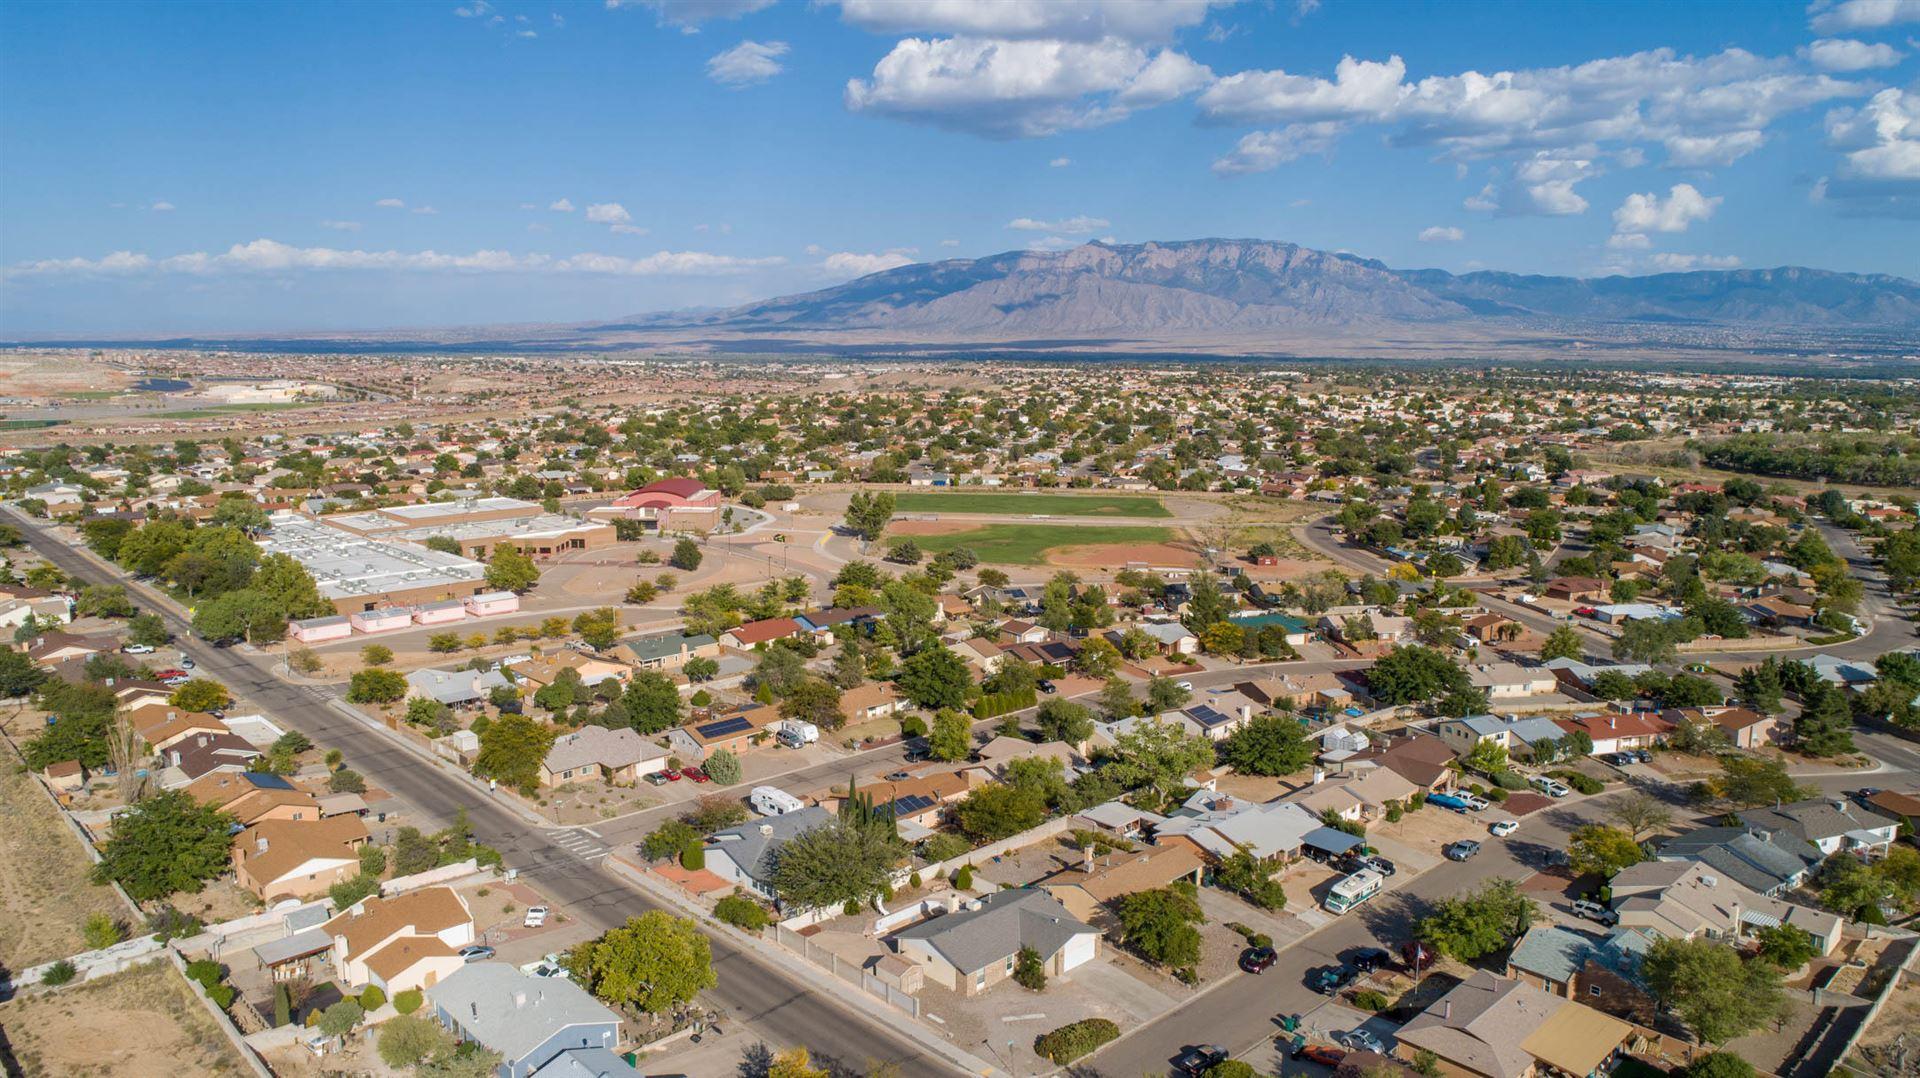 Photo of 200 LITTLER Drive SE, Rio Rancho, NM 87124 (MLS # 977969)